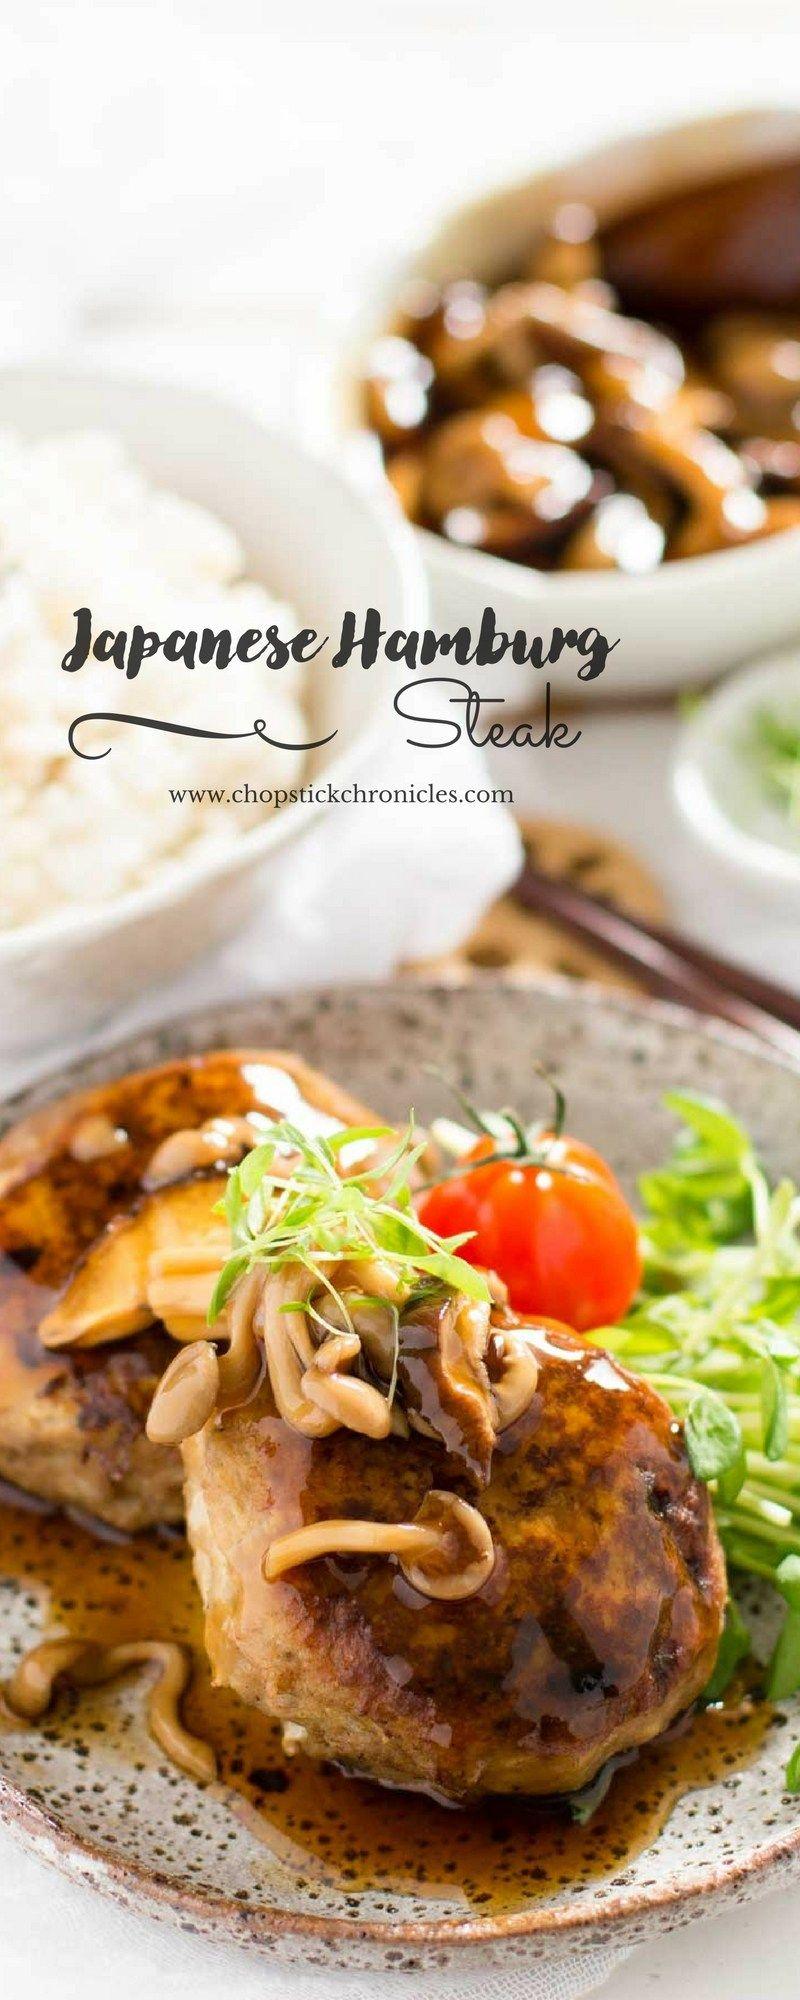 Japanese hamburg steak with mushroom sauce asian foods pinterest japanese hamburg steak with mushroom sauce asian food recipesasian foodsdinner forumfinder Choice Image